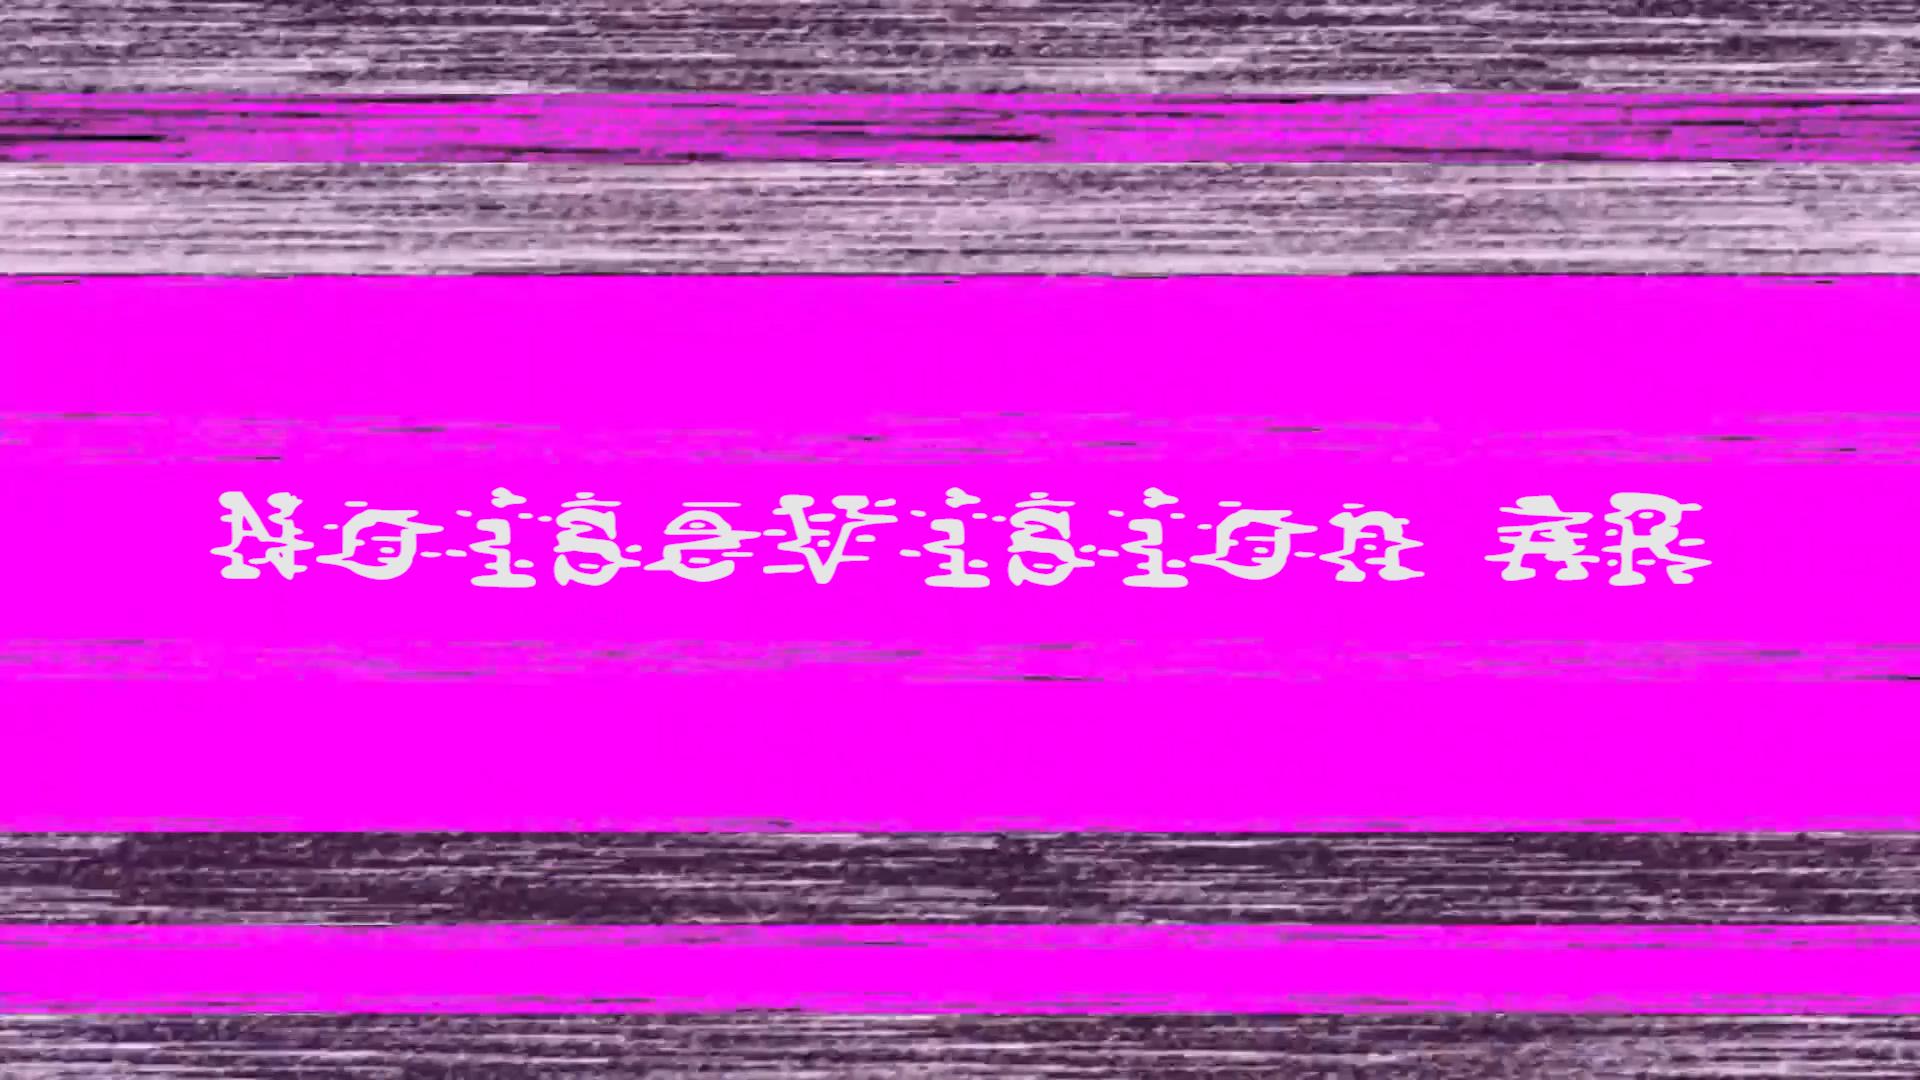 VHS Tape Overlay - 4K Green screen FREE DOWNLOAD (1080p)0.jpg